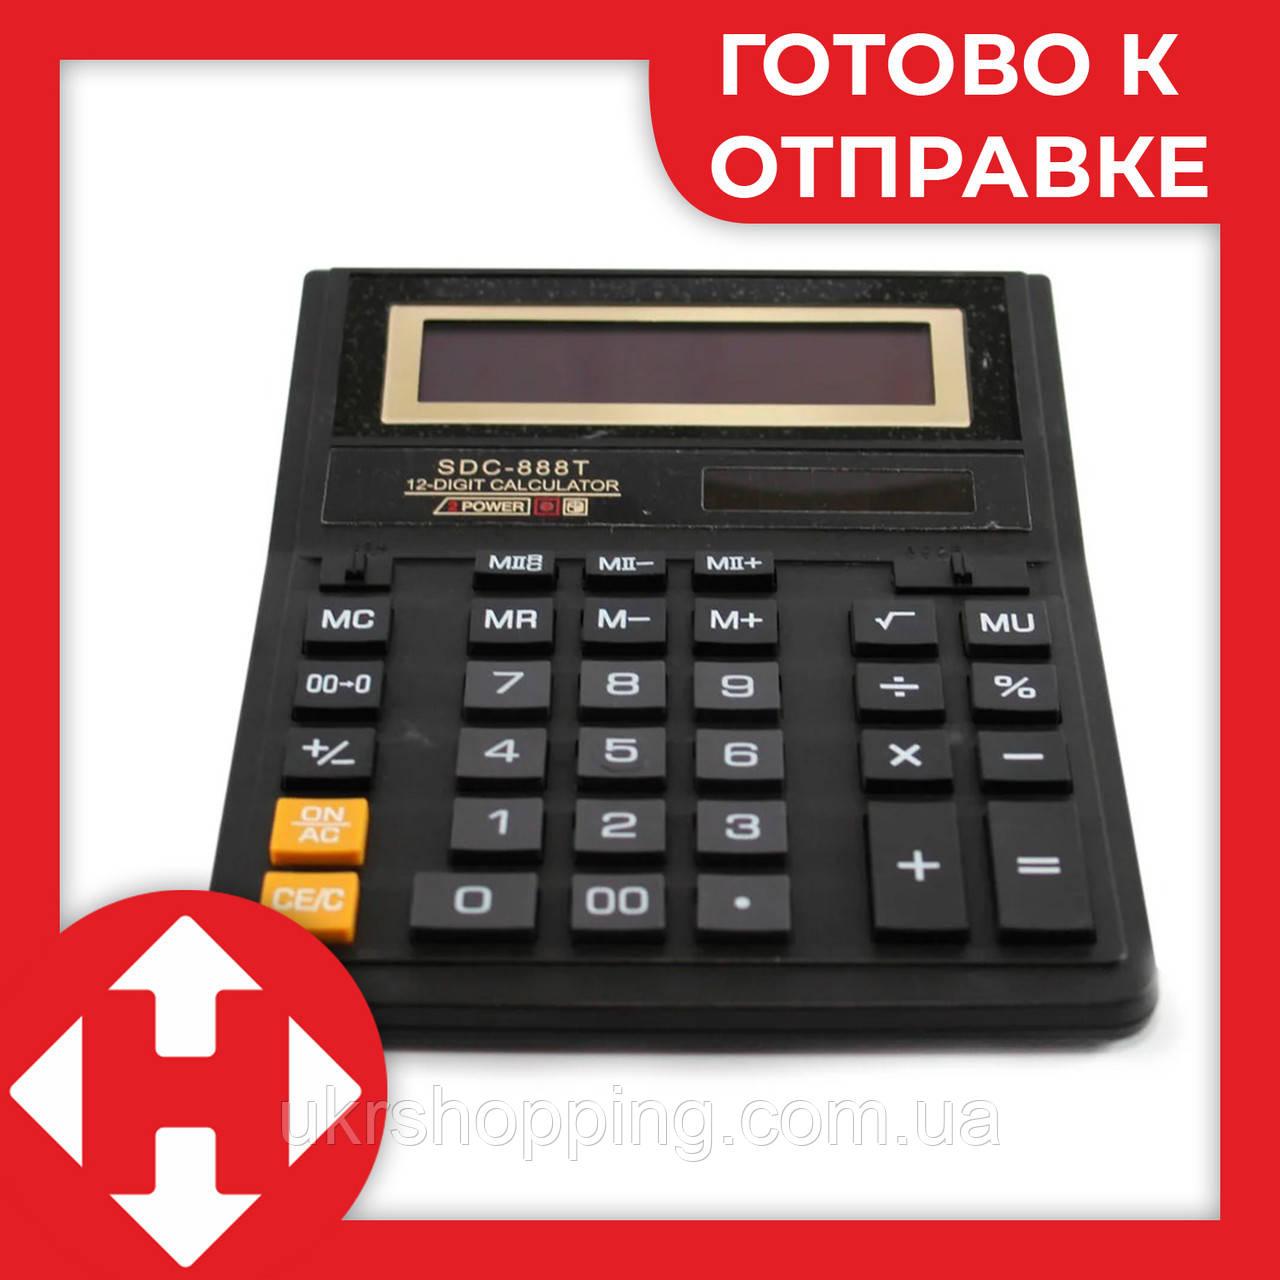 Калькулятор, SDC-888T, калькулятор 888.Надежный, процентный калькулятор